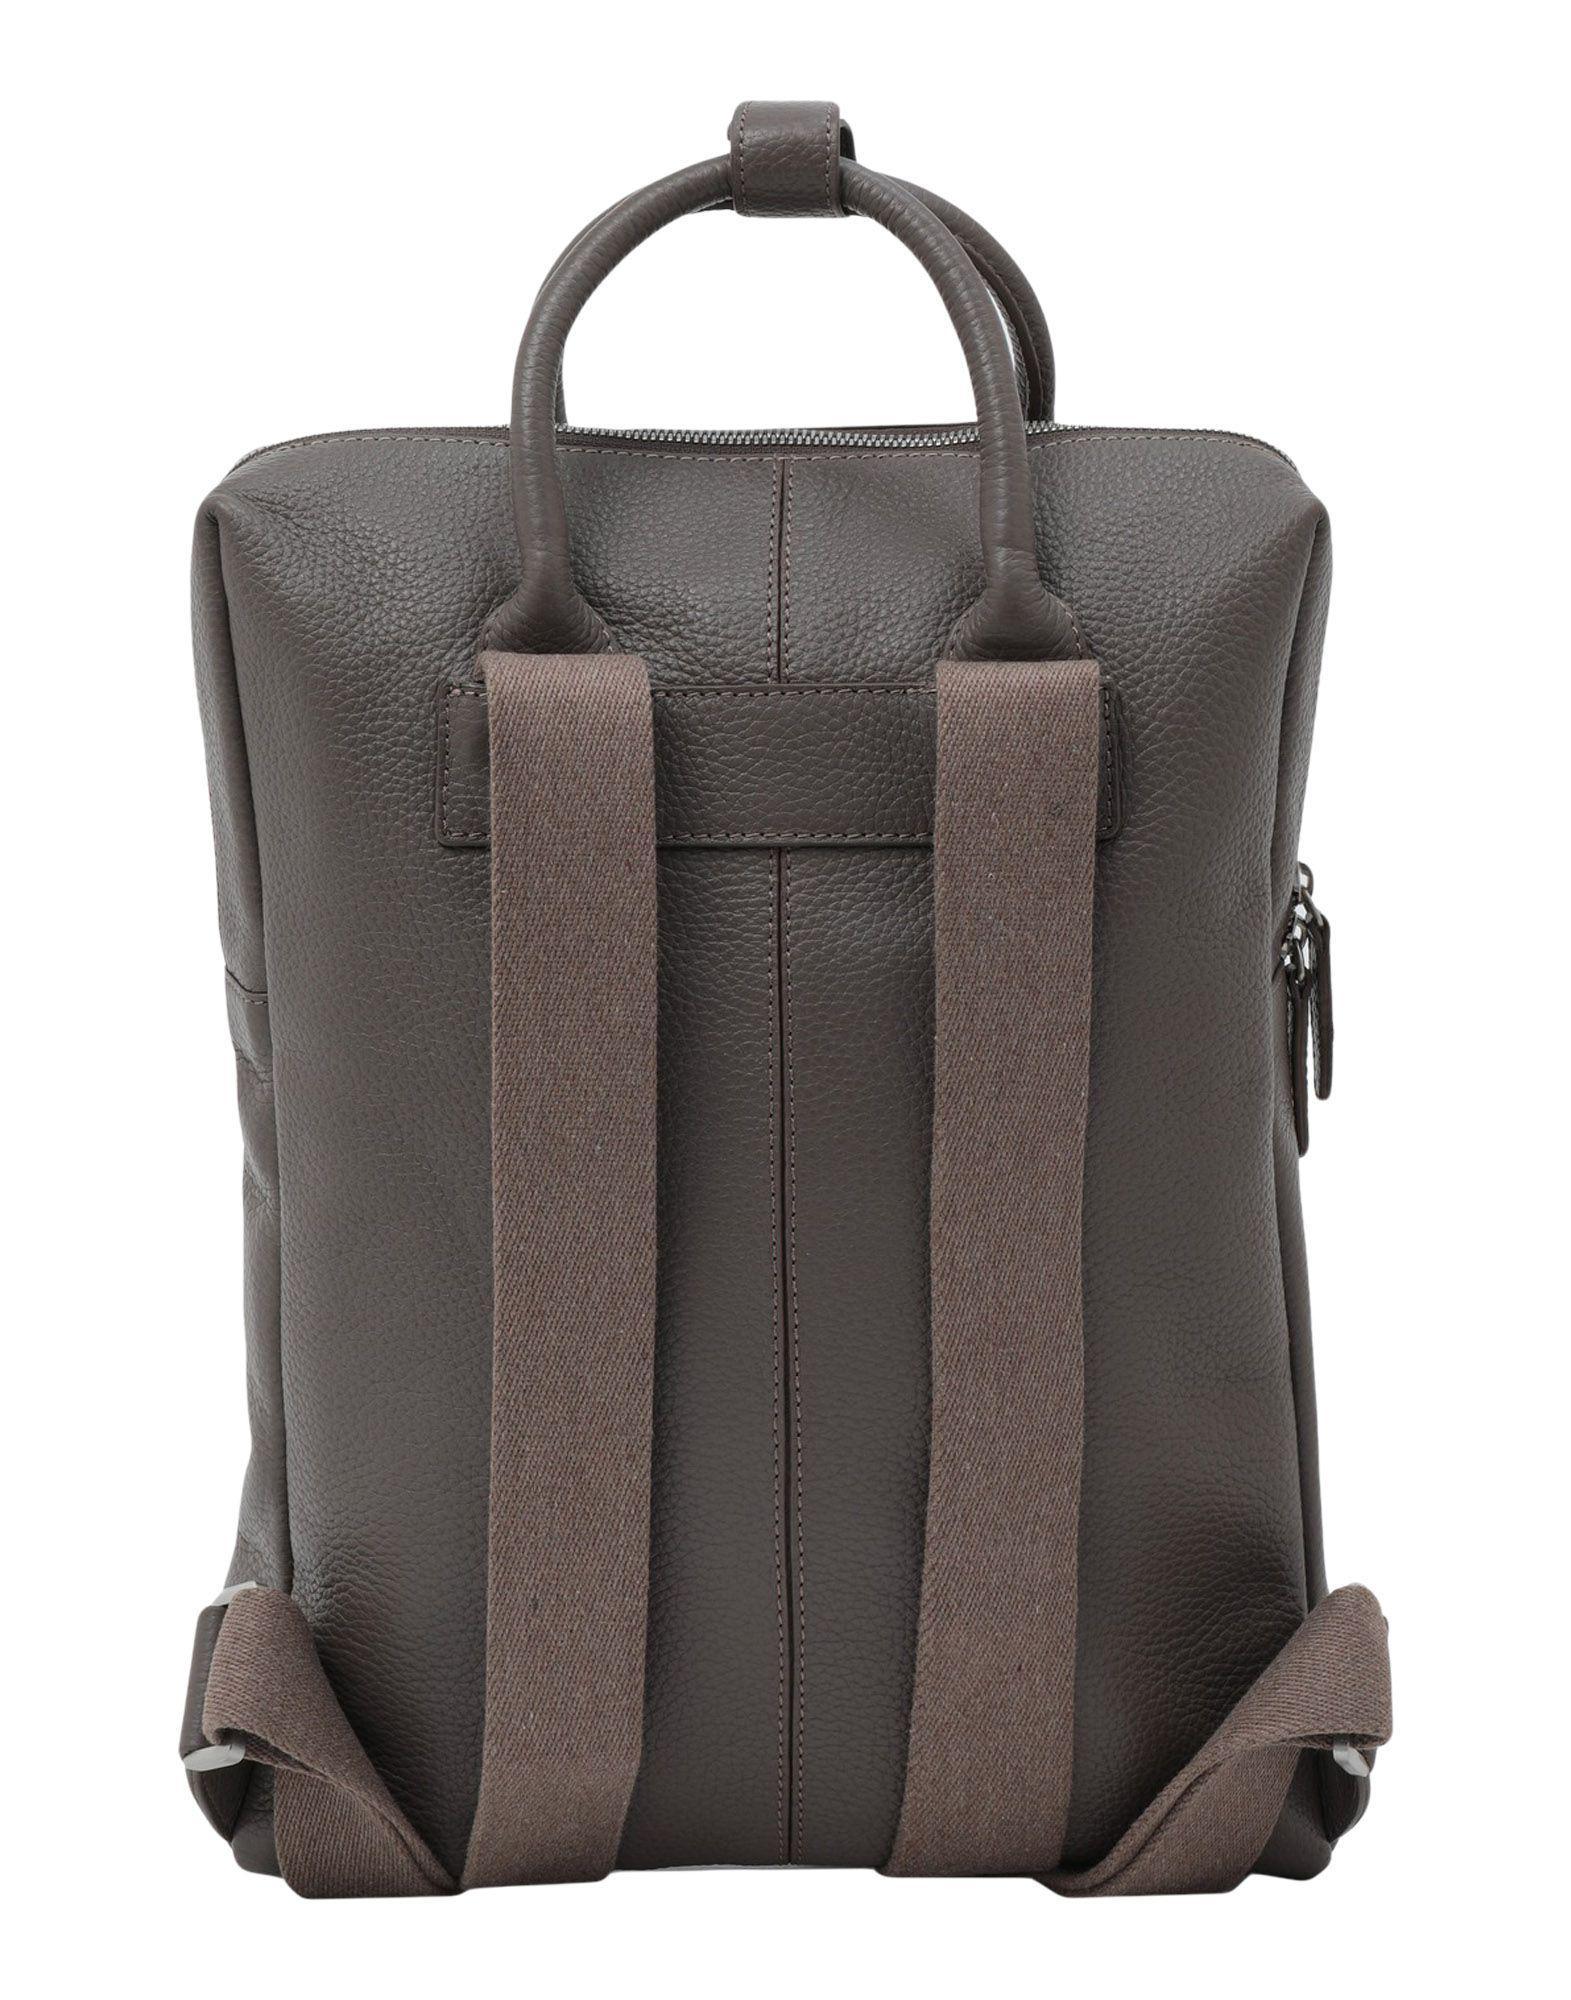 amp; For Men Ungaro Emanuel Bum Lyst Backpacks Bags qHF6E4xfn